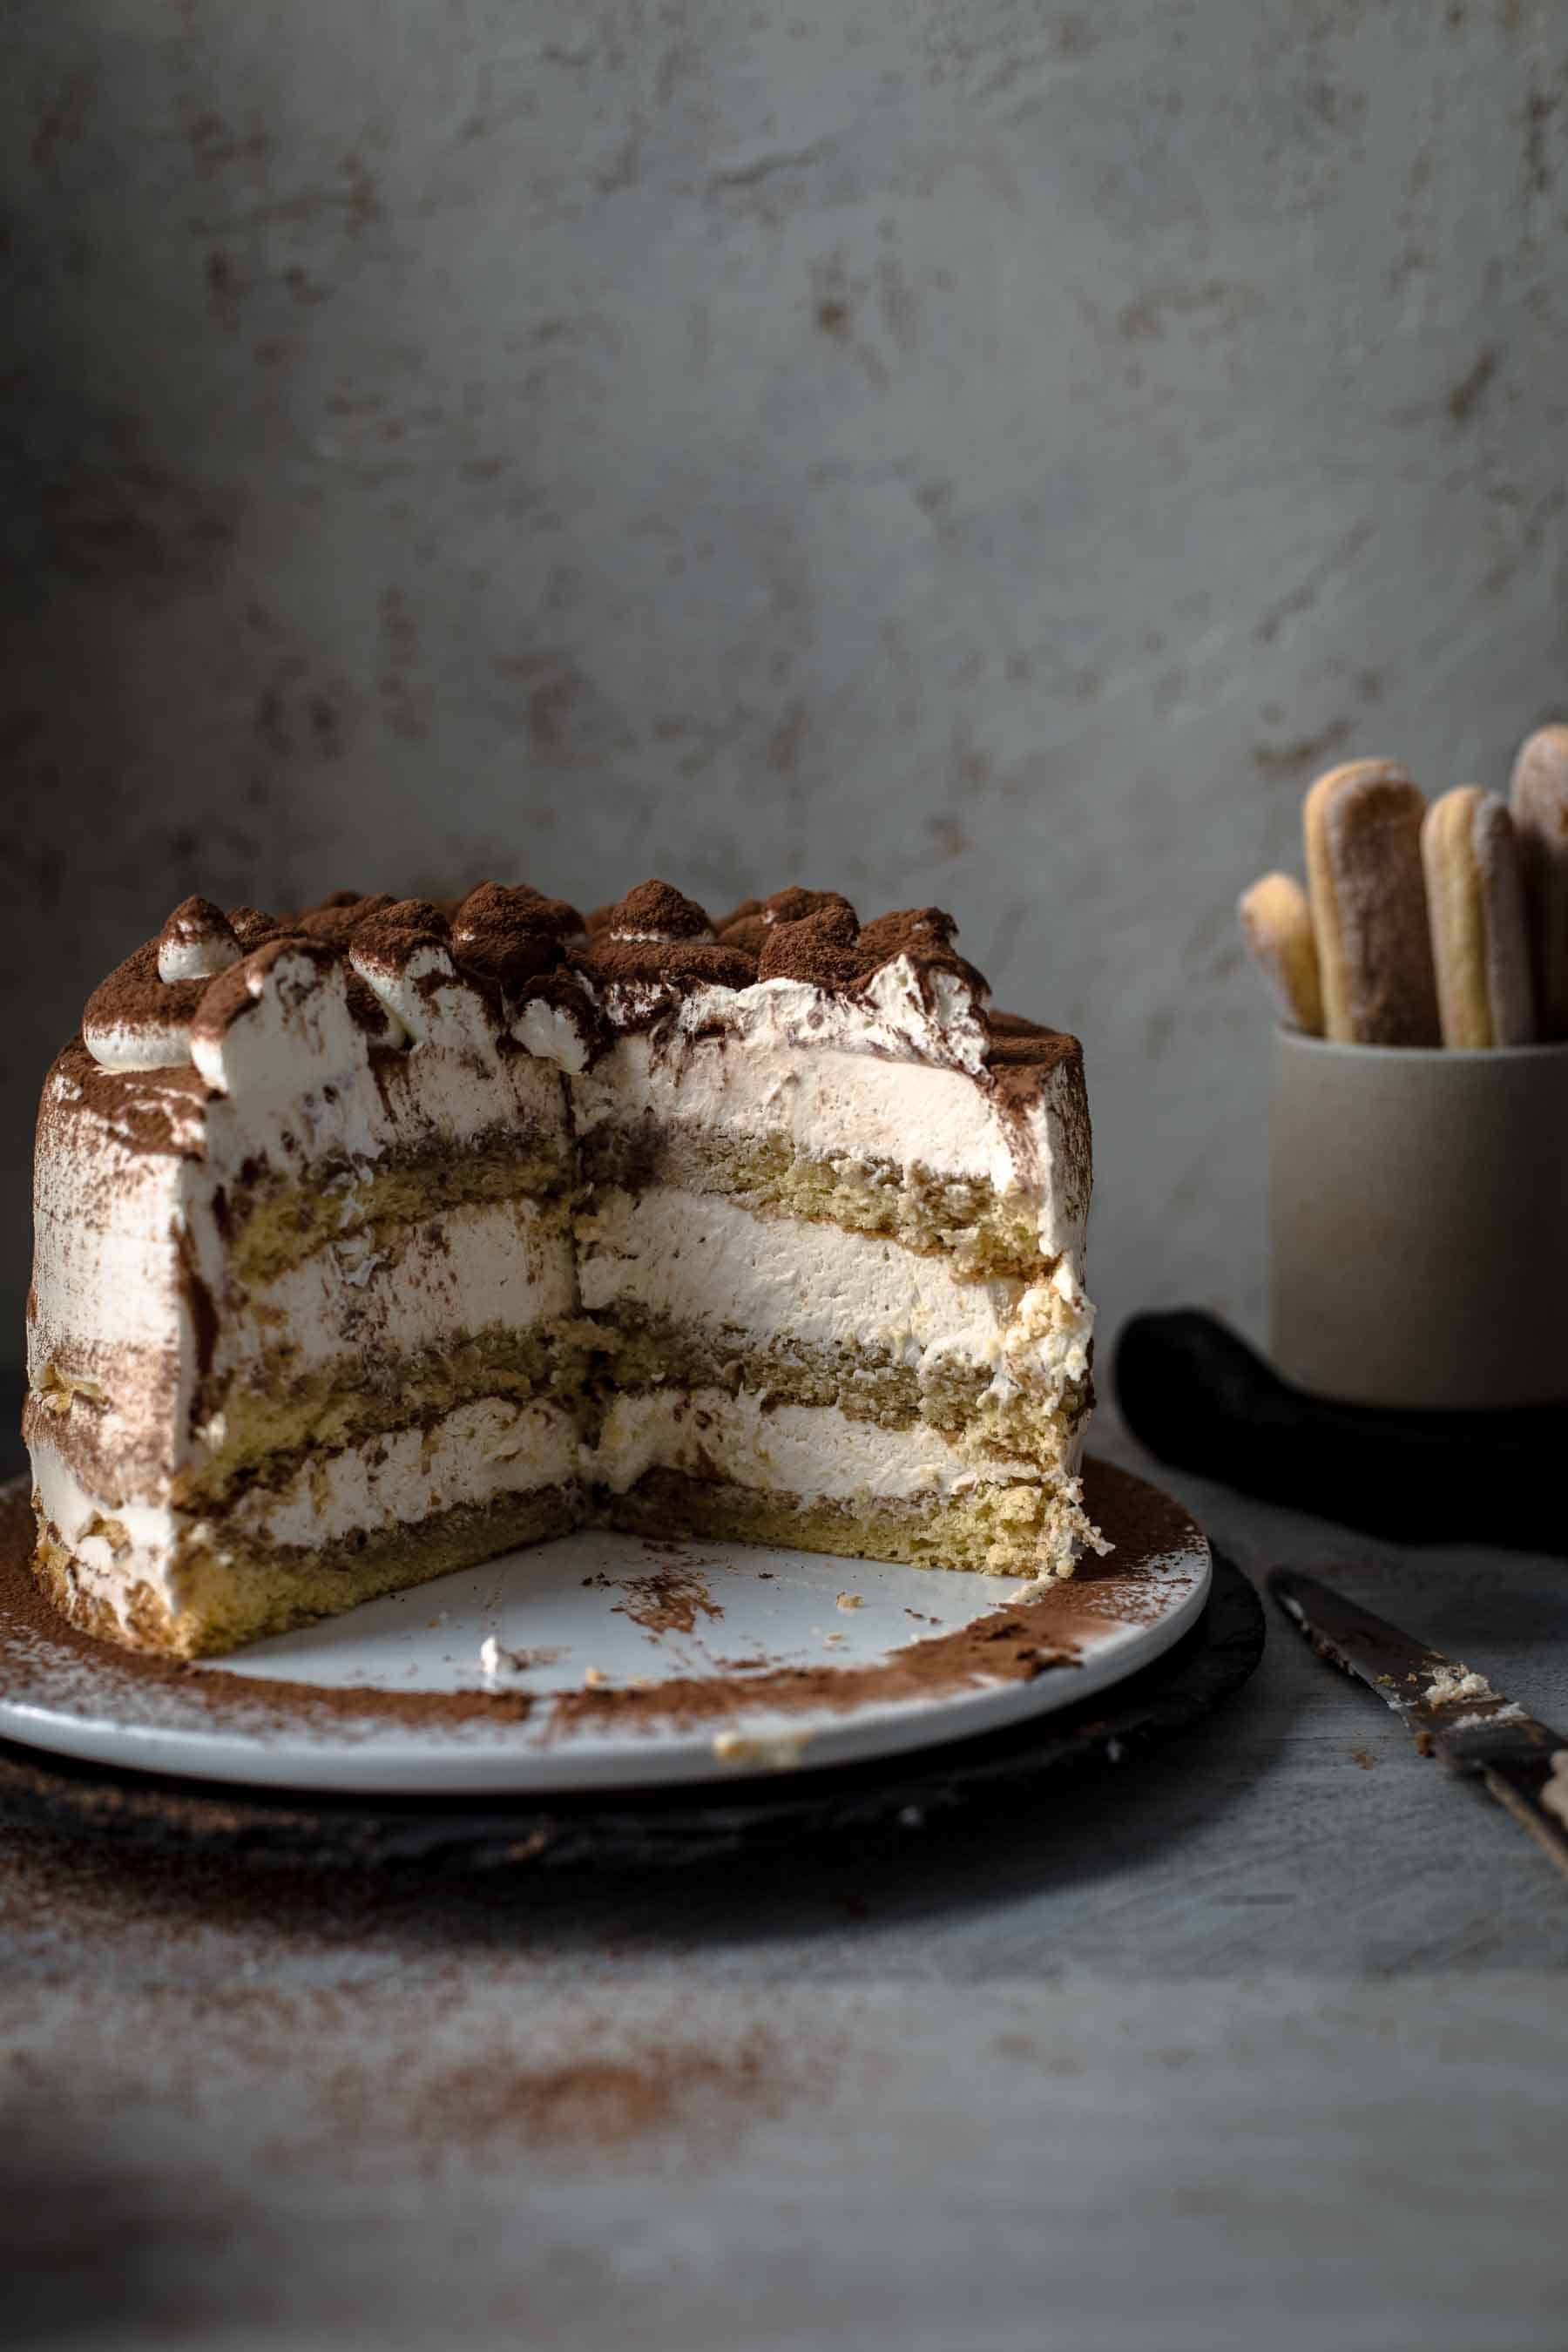 This Super Delicious Tiramisu Cake Recipe Comes With Detailed Step